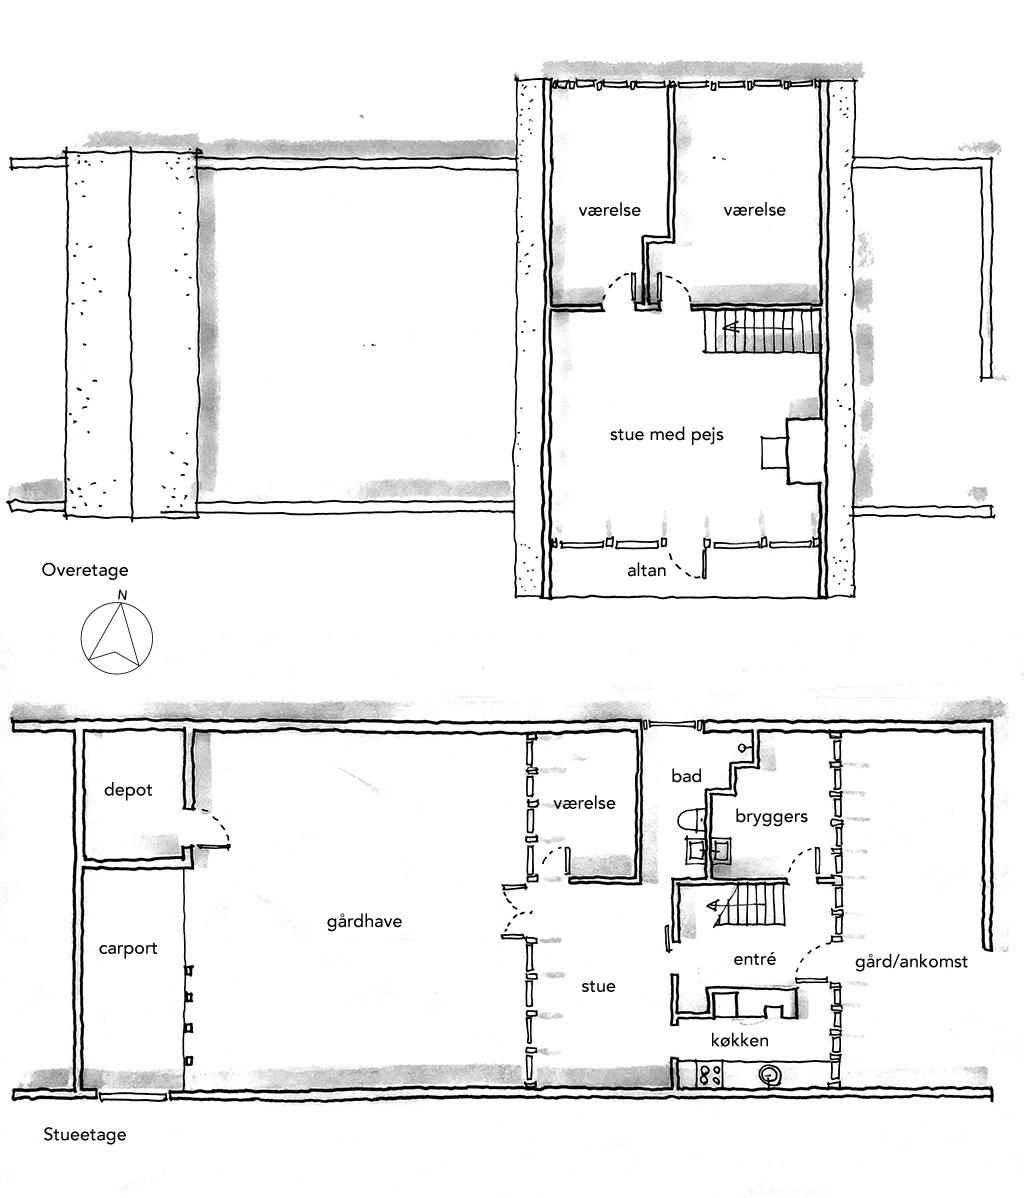 Arkitekttegnet skitse, arkitekttegnet planskitse